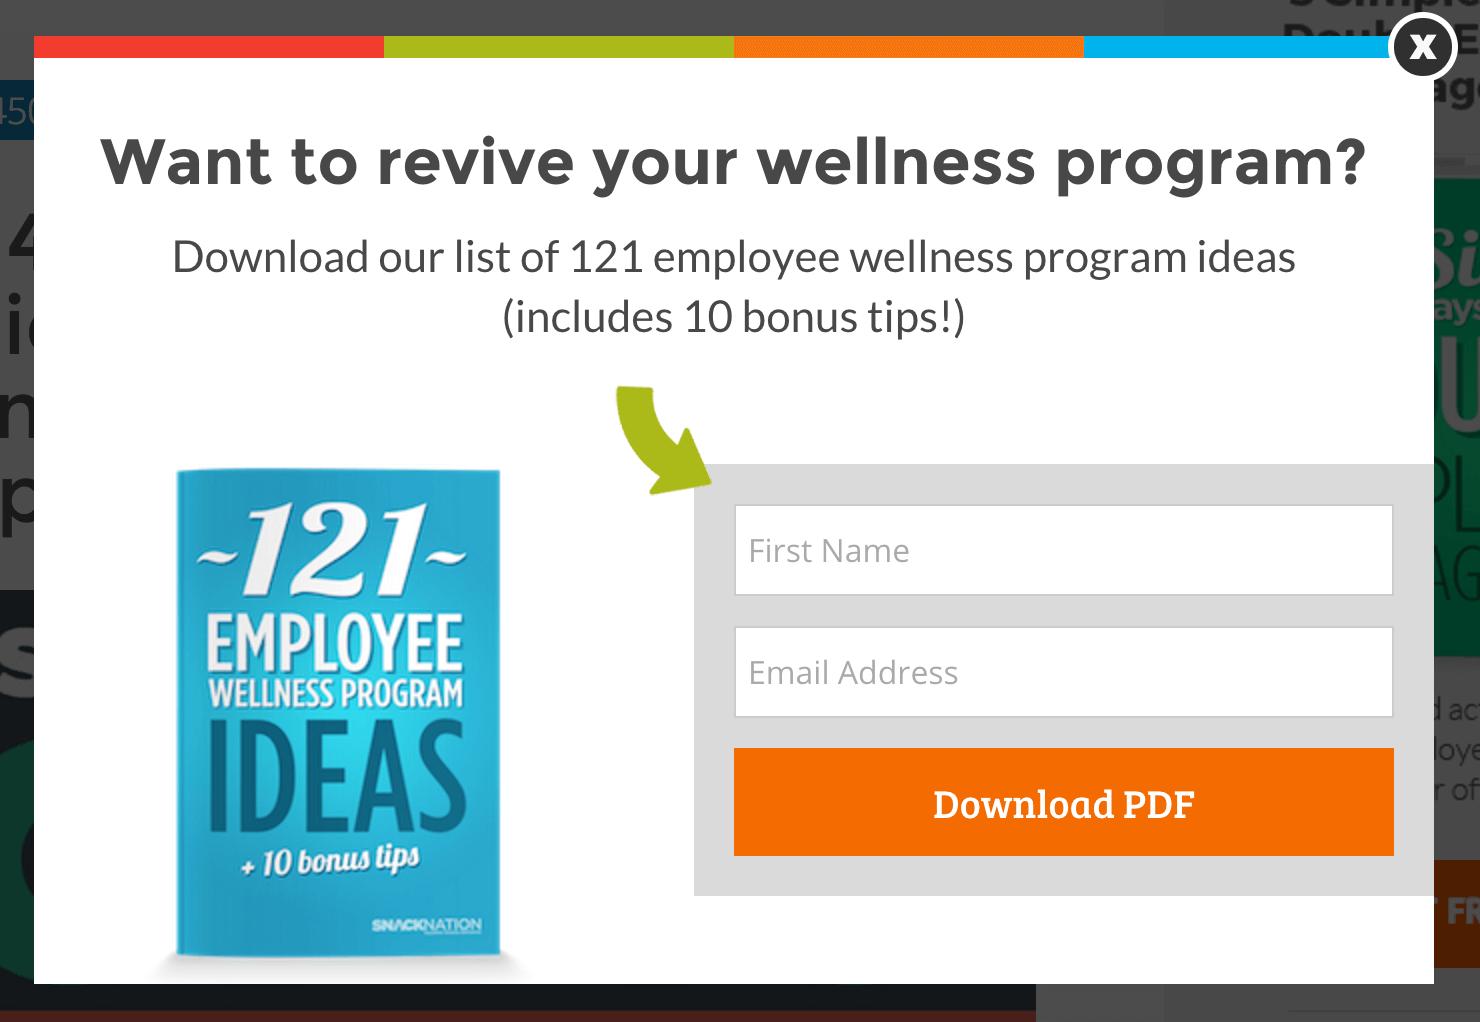 Top_40_Corporate_Wellness_Companies_Transforming_Health